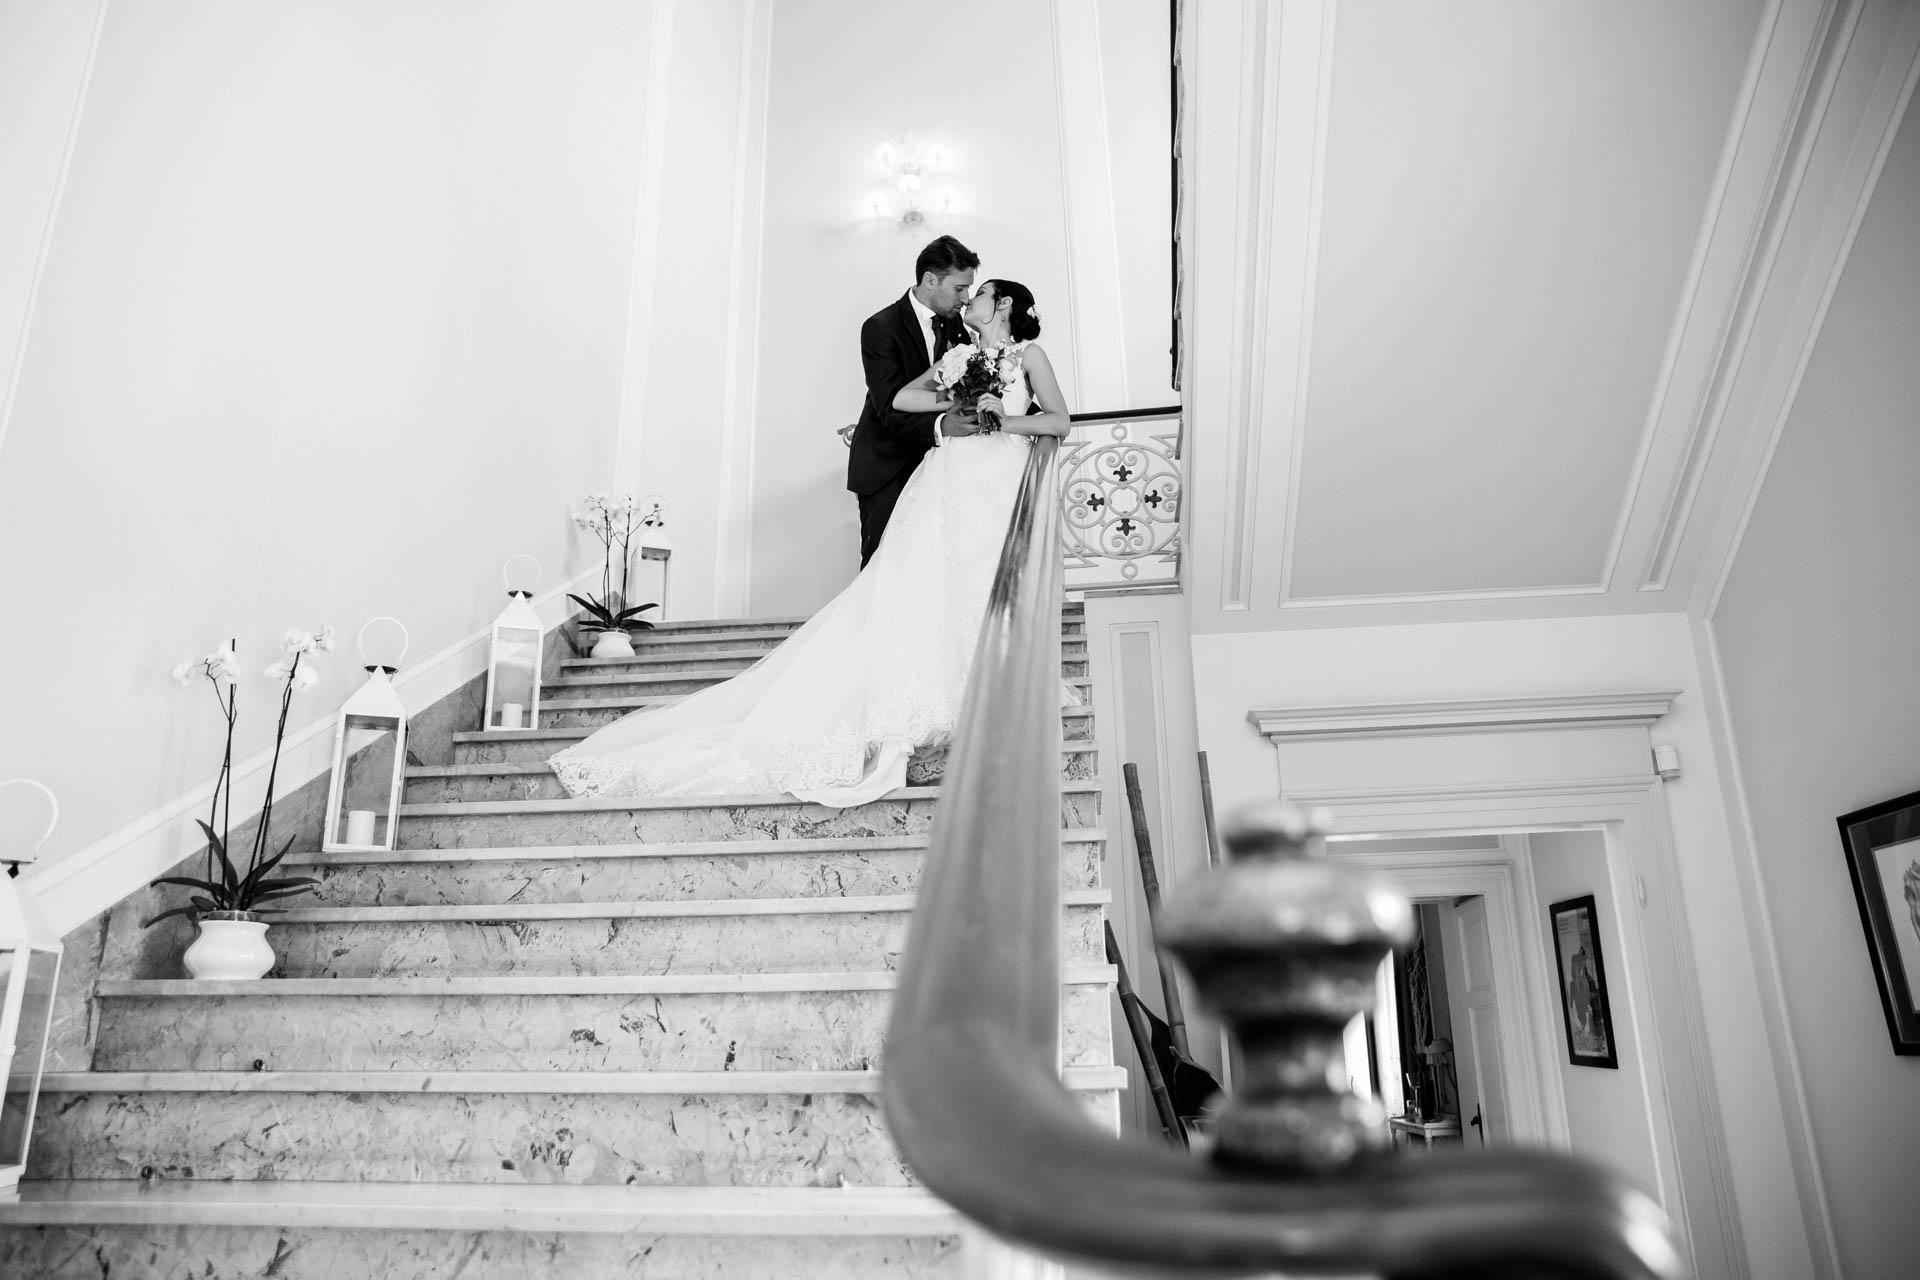 sposi scala bacio bianco nero